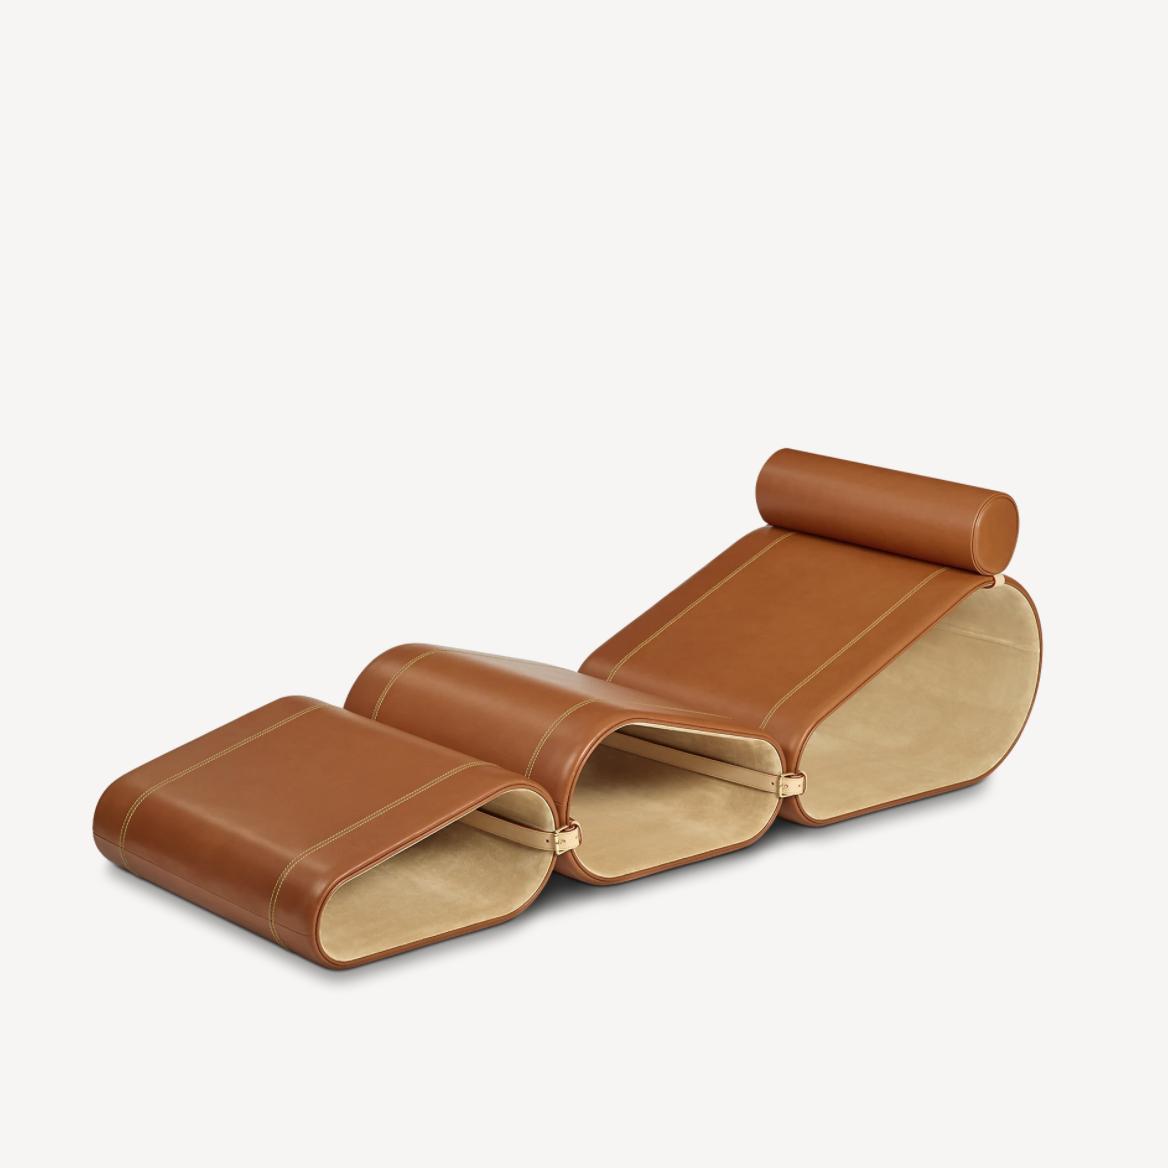 Louis Vuitton Objets Nomades系列 便携躺椅